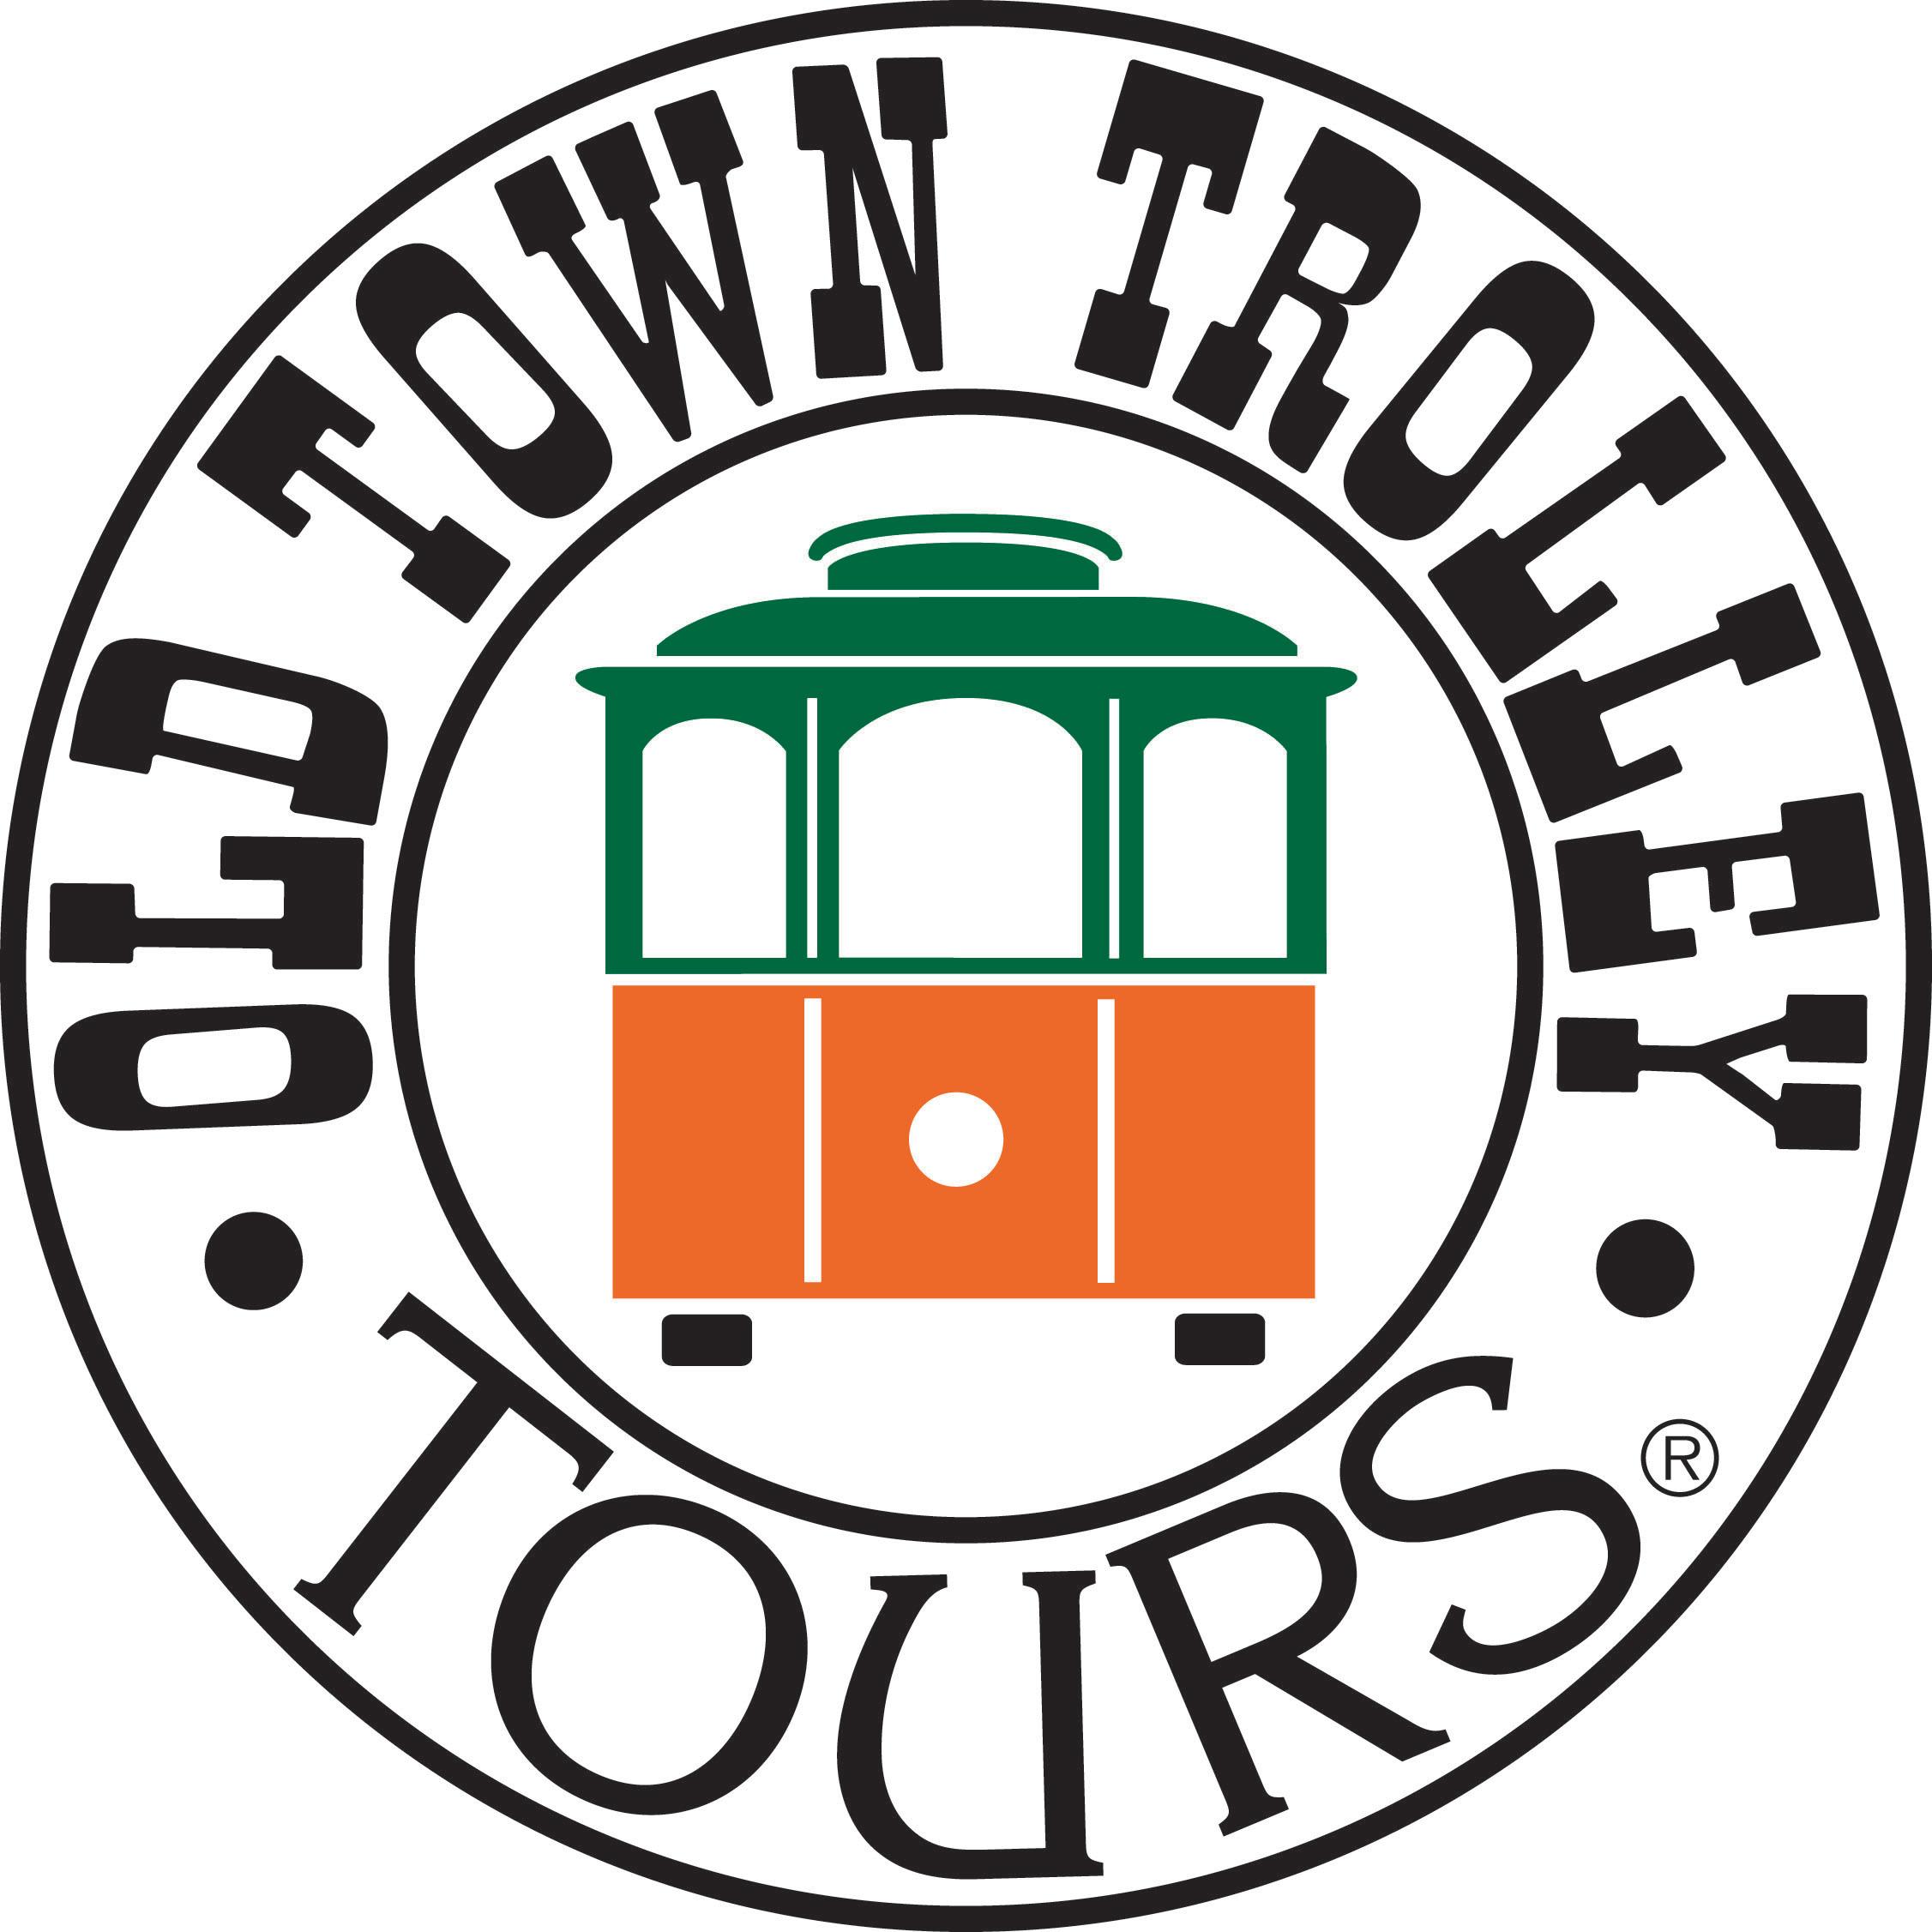 www.trolleytours.com